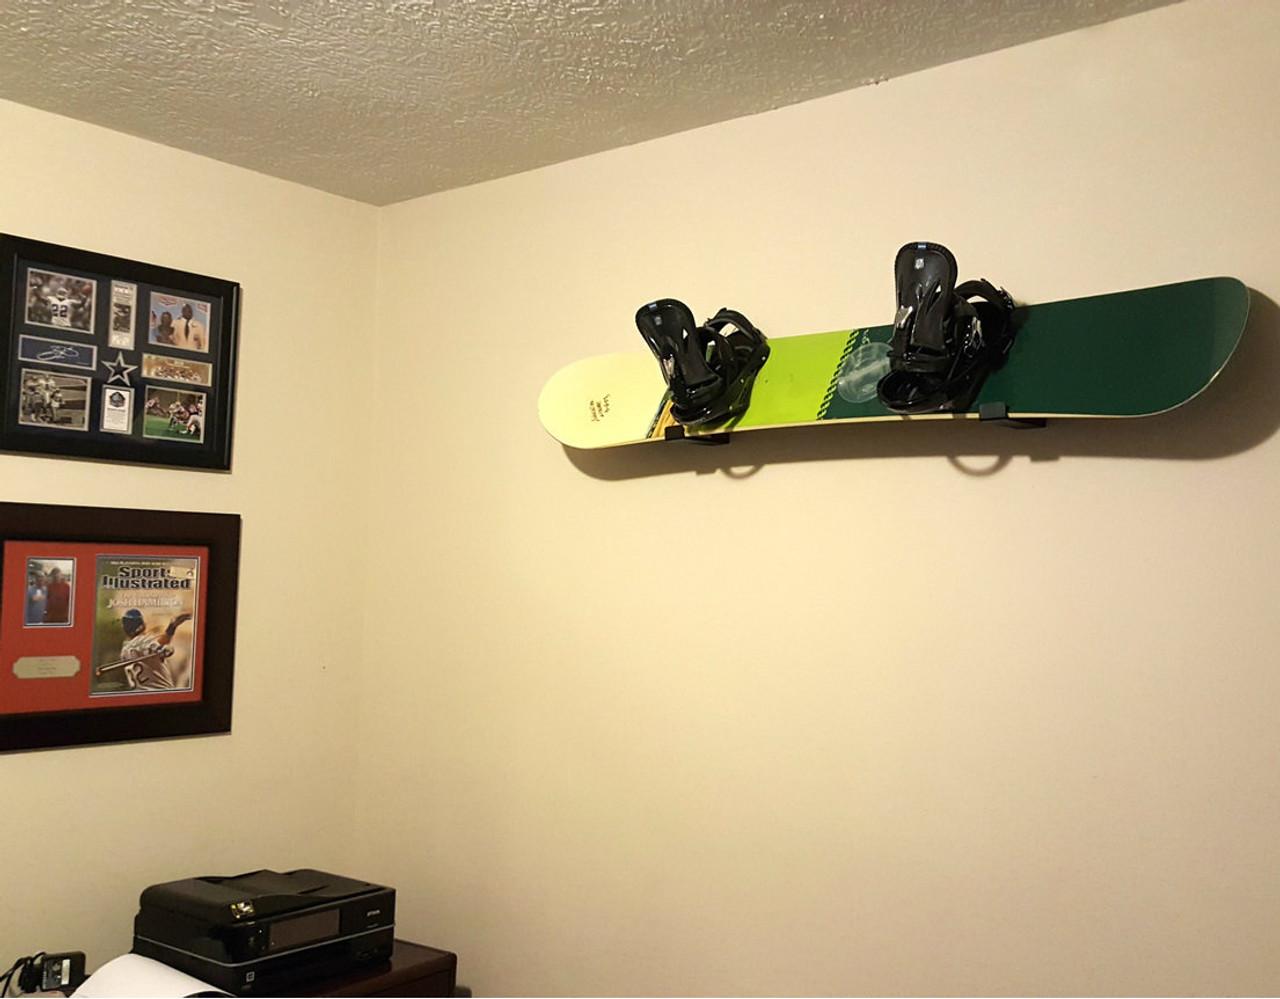 Naked Snow  Minimalist Snowboard Rack - Storeyourboardcom-8571